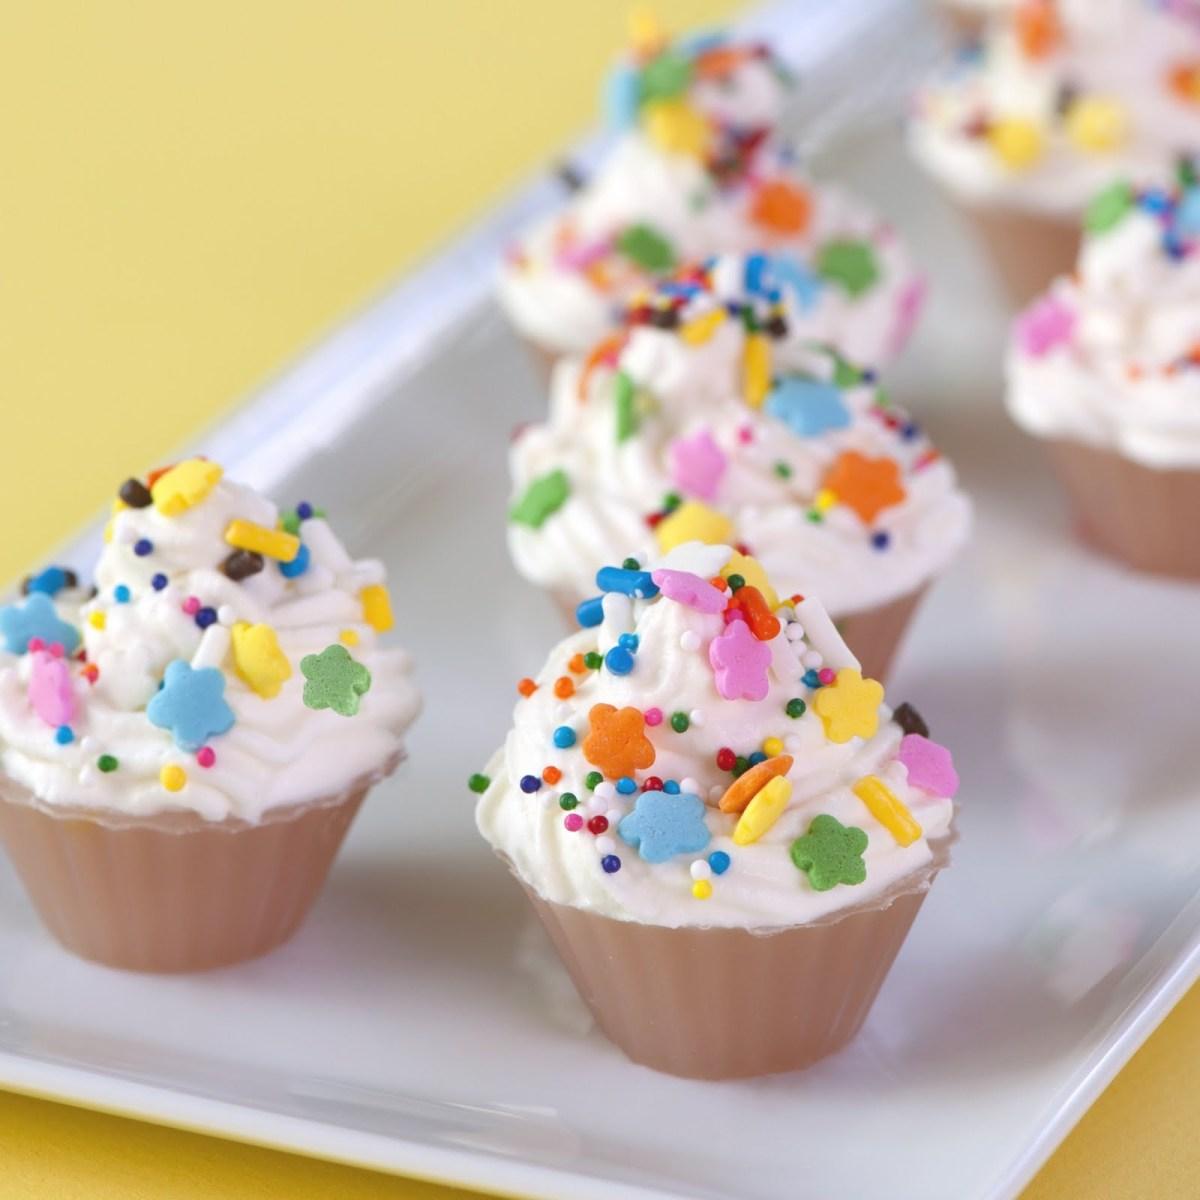 Surprising Birthday Cake Pudding Shots Birthday Cake Pudding Shots Tipsy Personalised Birthday Cards Veneteletsinfo